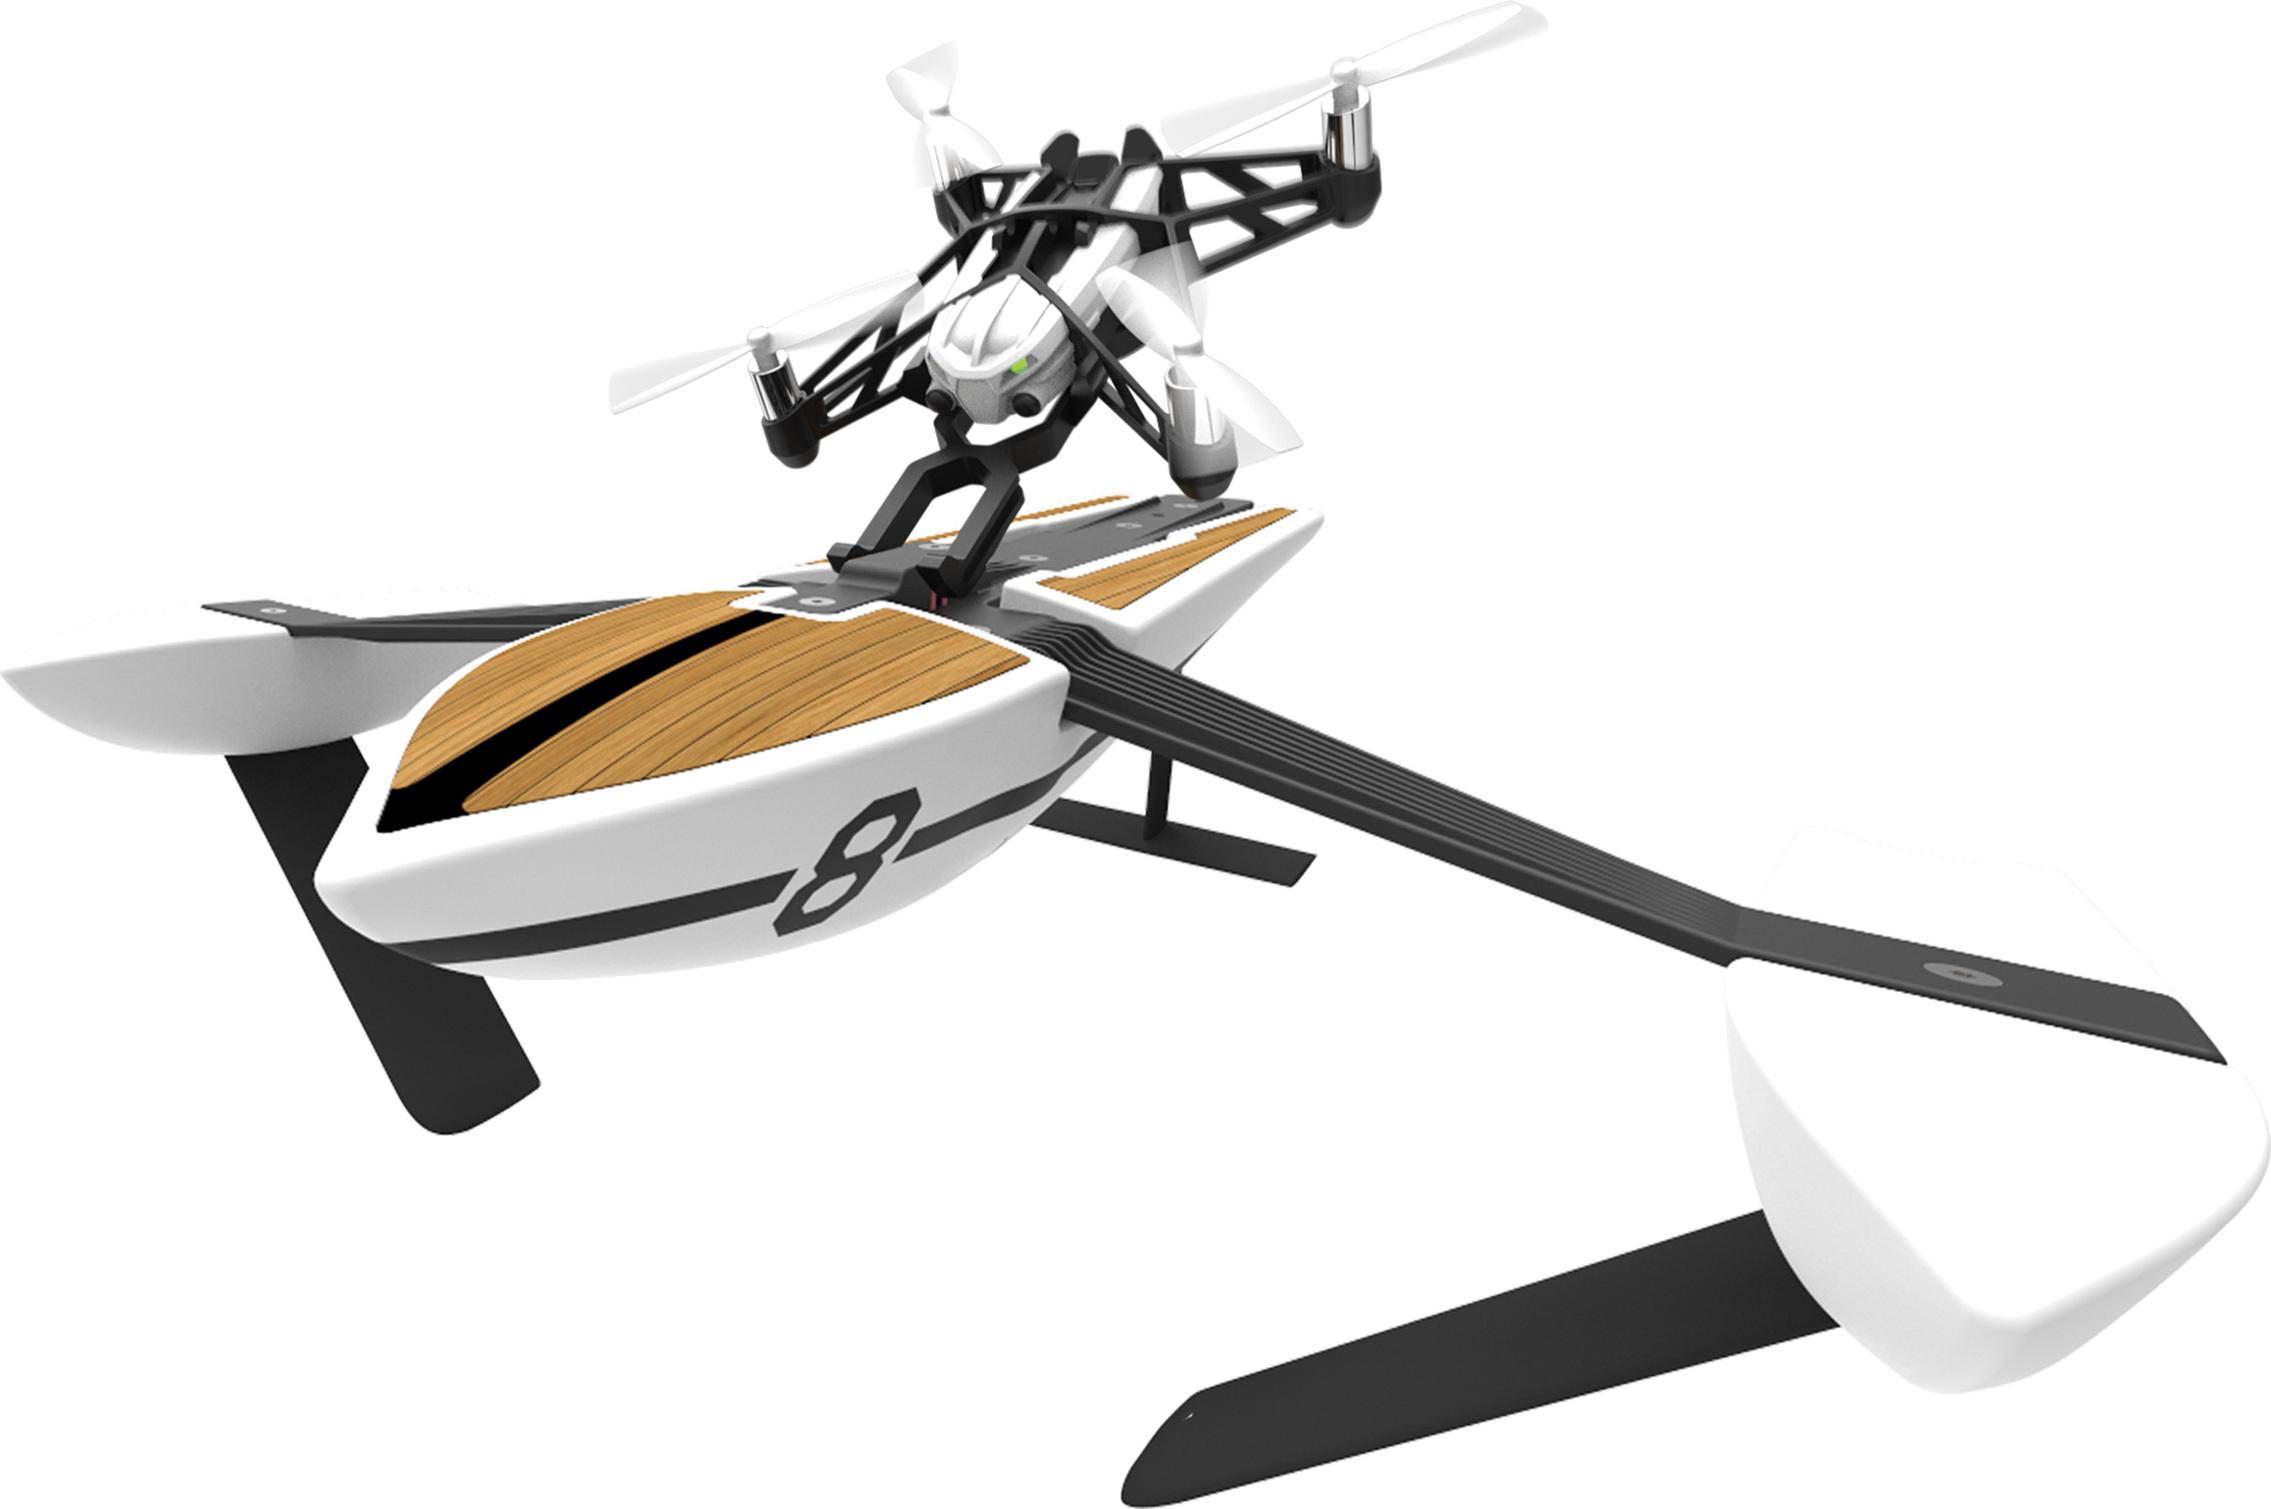 dronex pro maroc